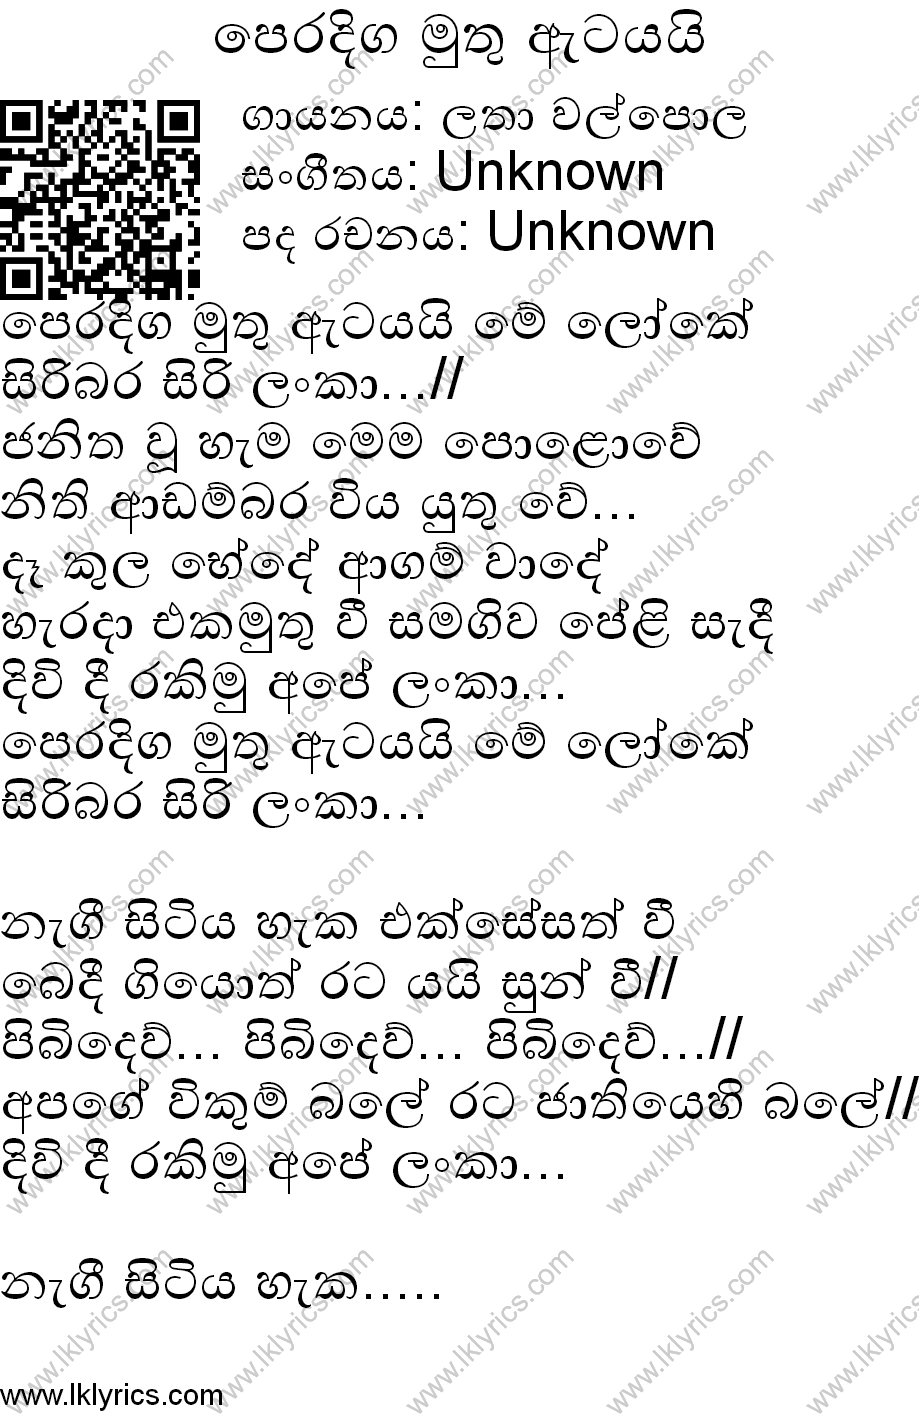 Deshabhimani Songs Mp3 Free Download - Mp3Take